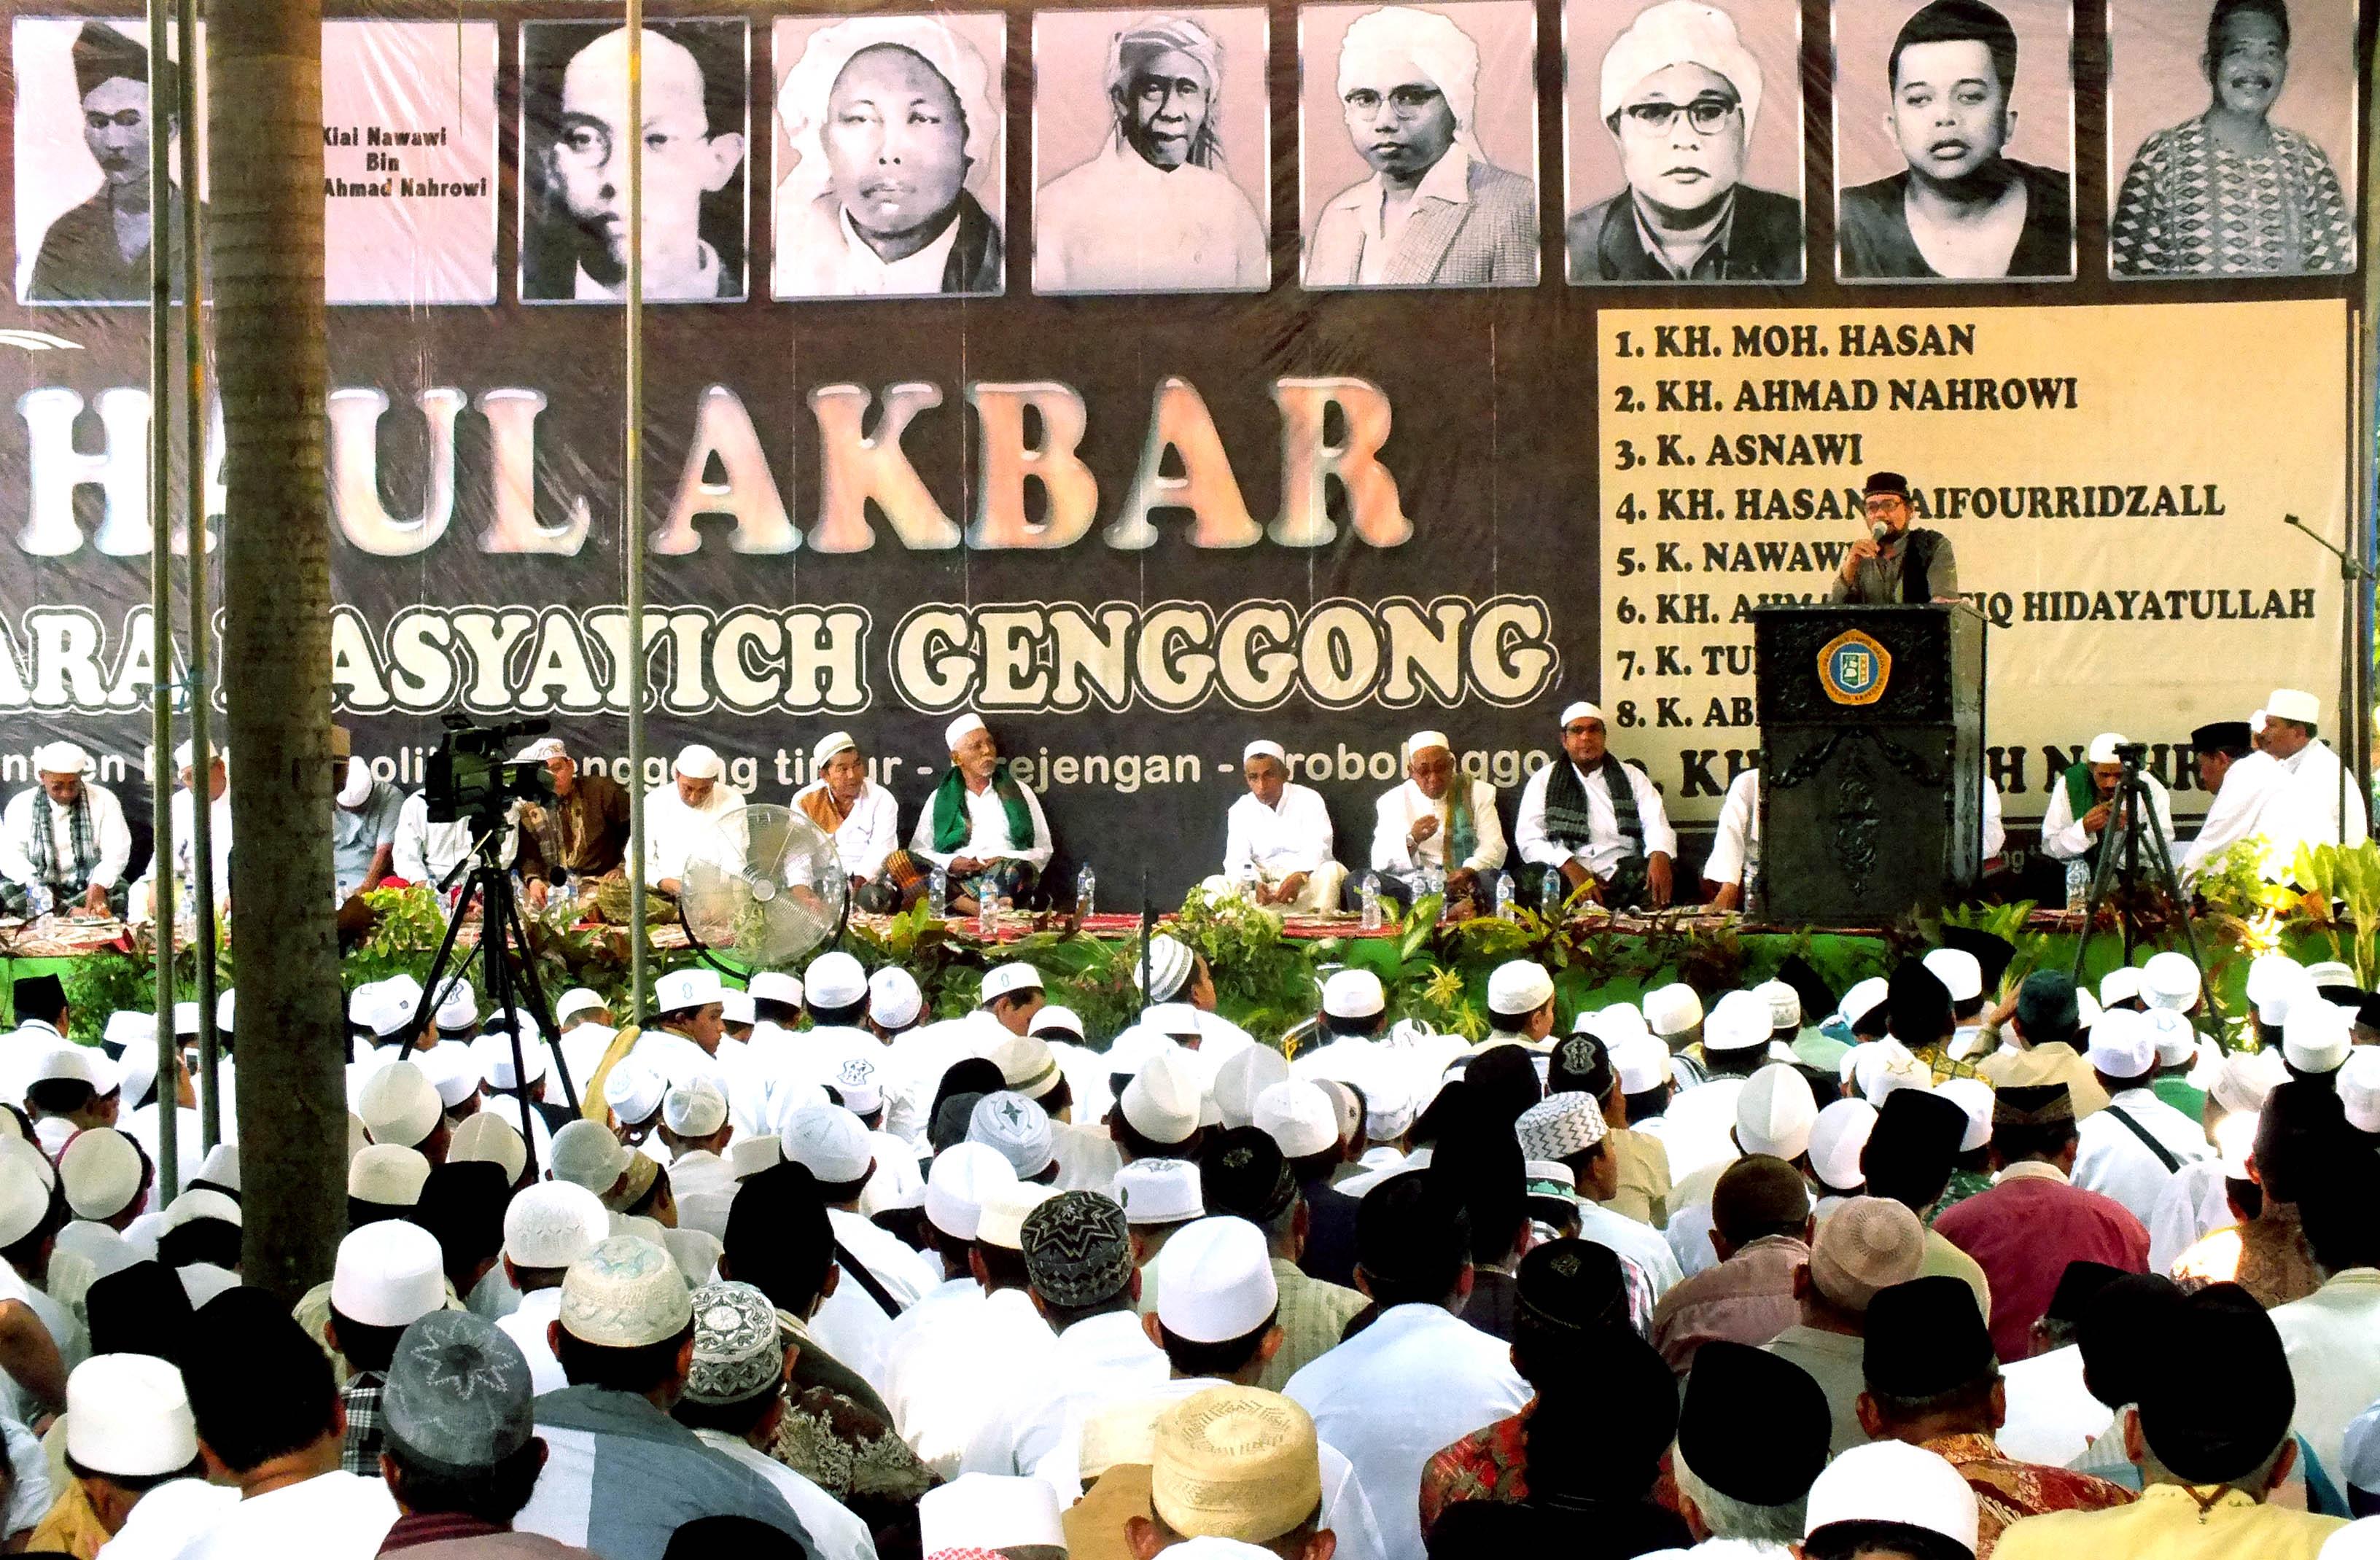 Pengasuh Pesantren Zainul Hasan Genggong K.H. Moh. Hasan Saiful Islam ketika membacakan manaqib Almarhum K.H. Sholeh Nahrowi, Kamis (7/10/2016)